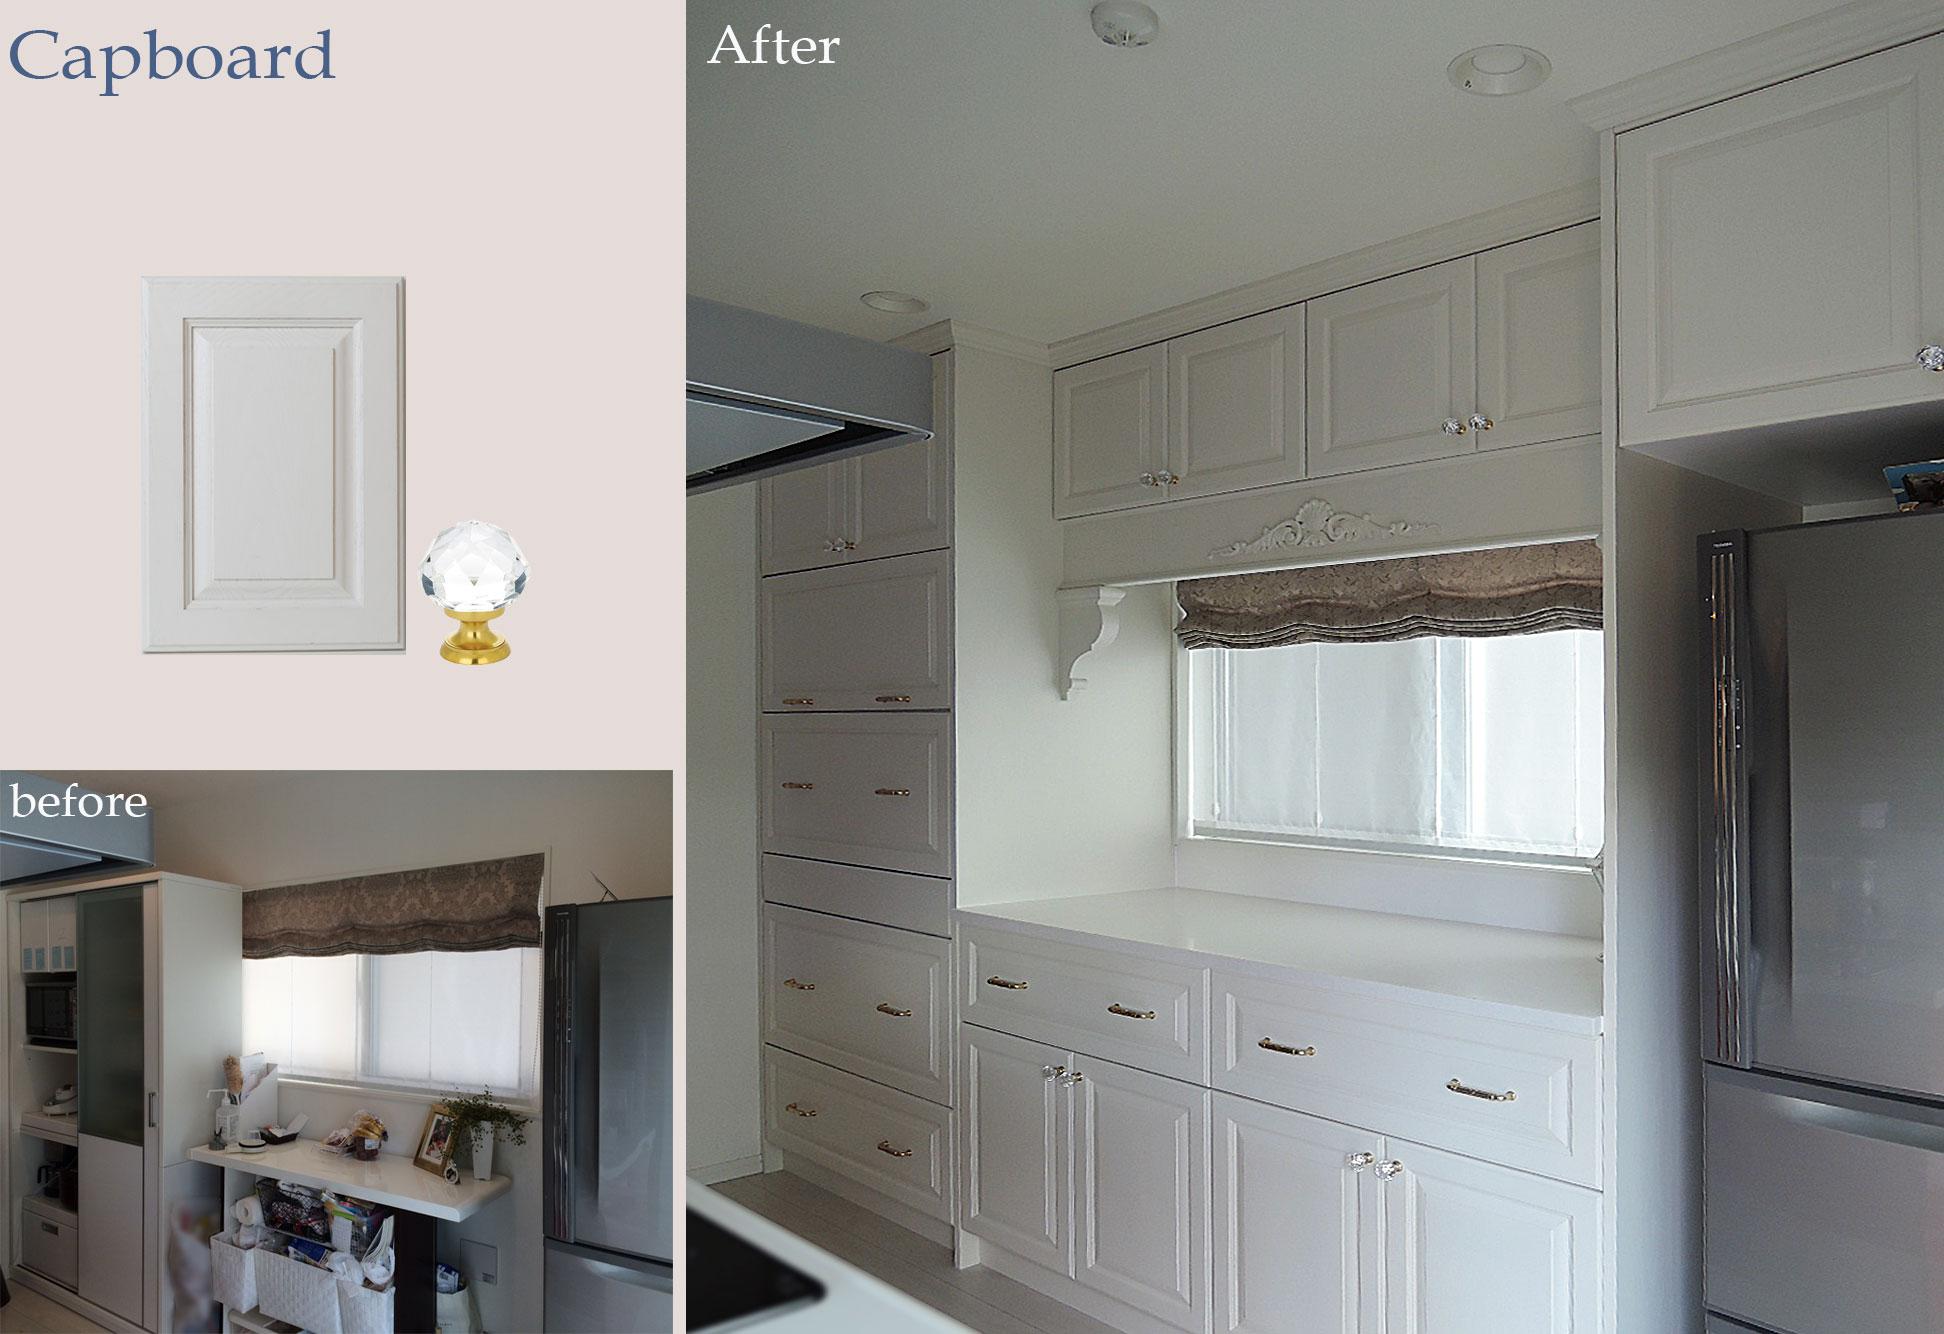 cupboard2.jpg